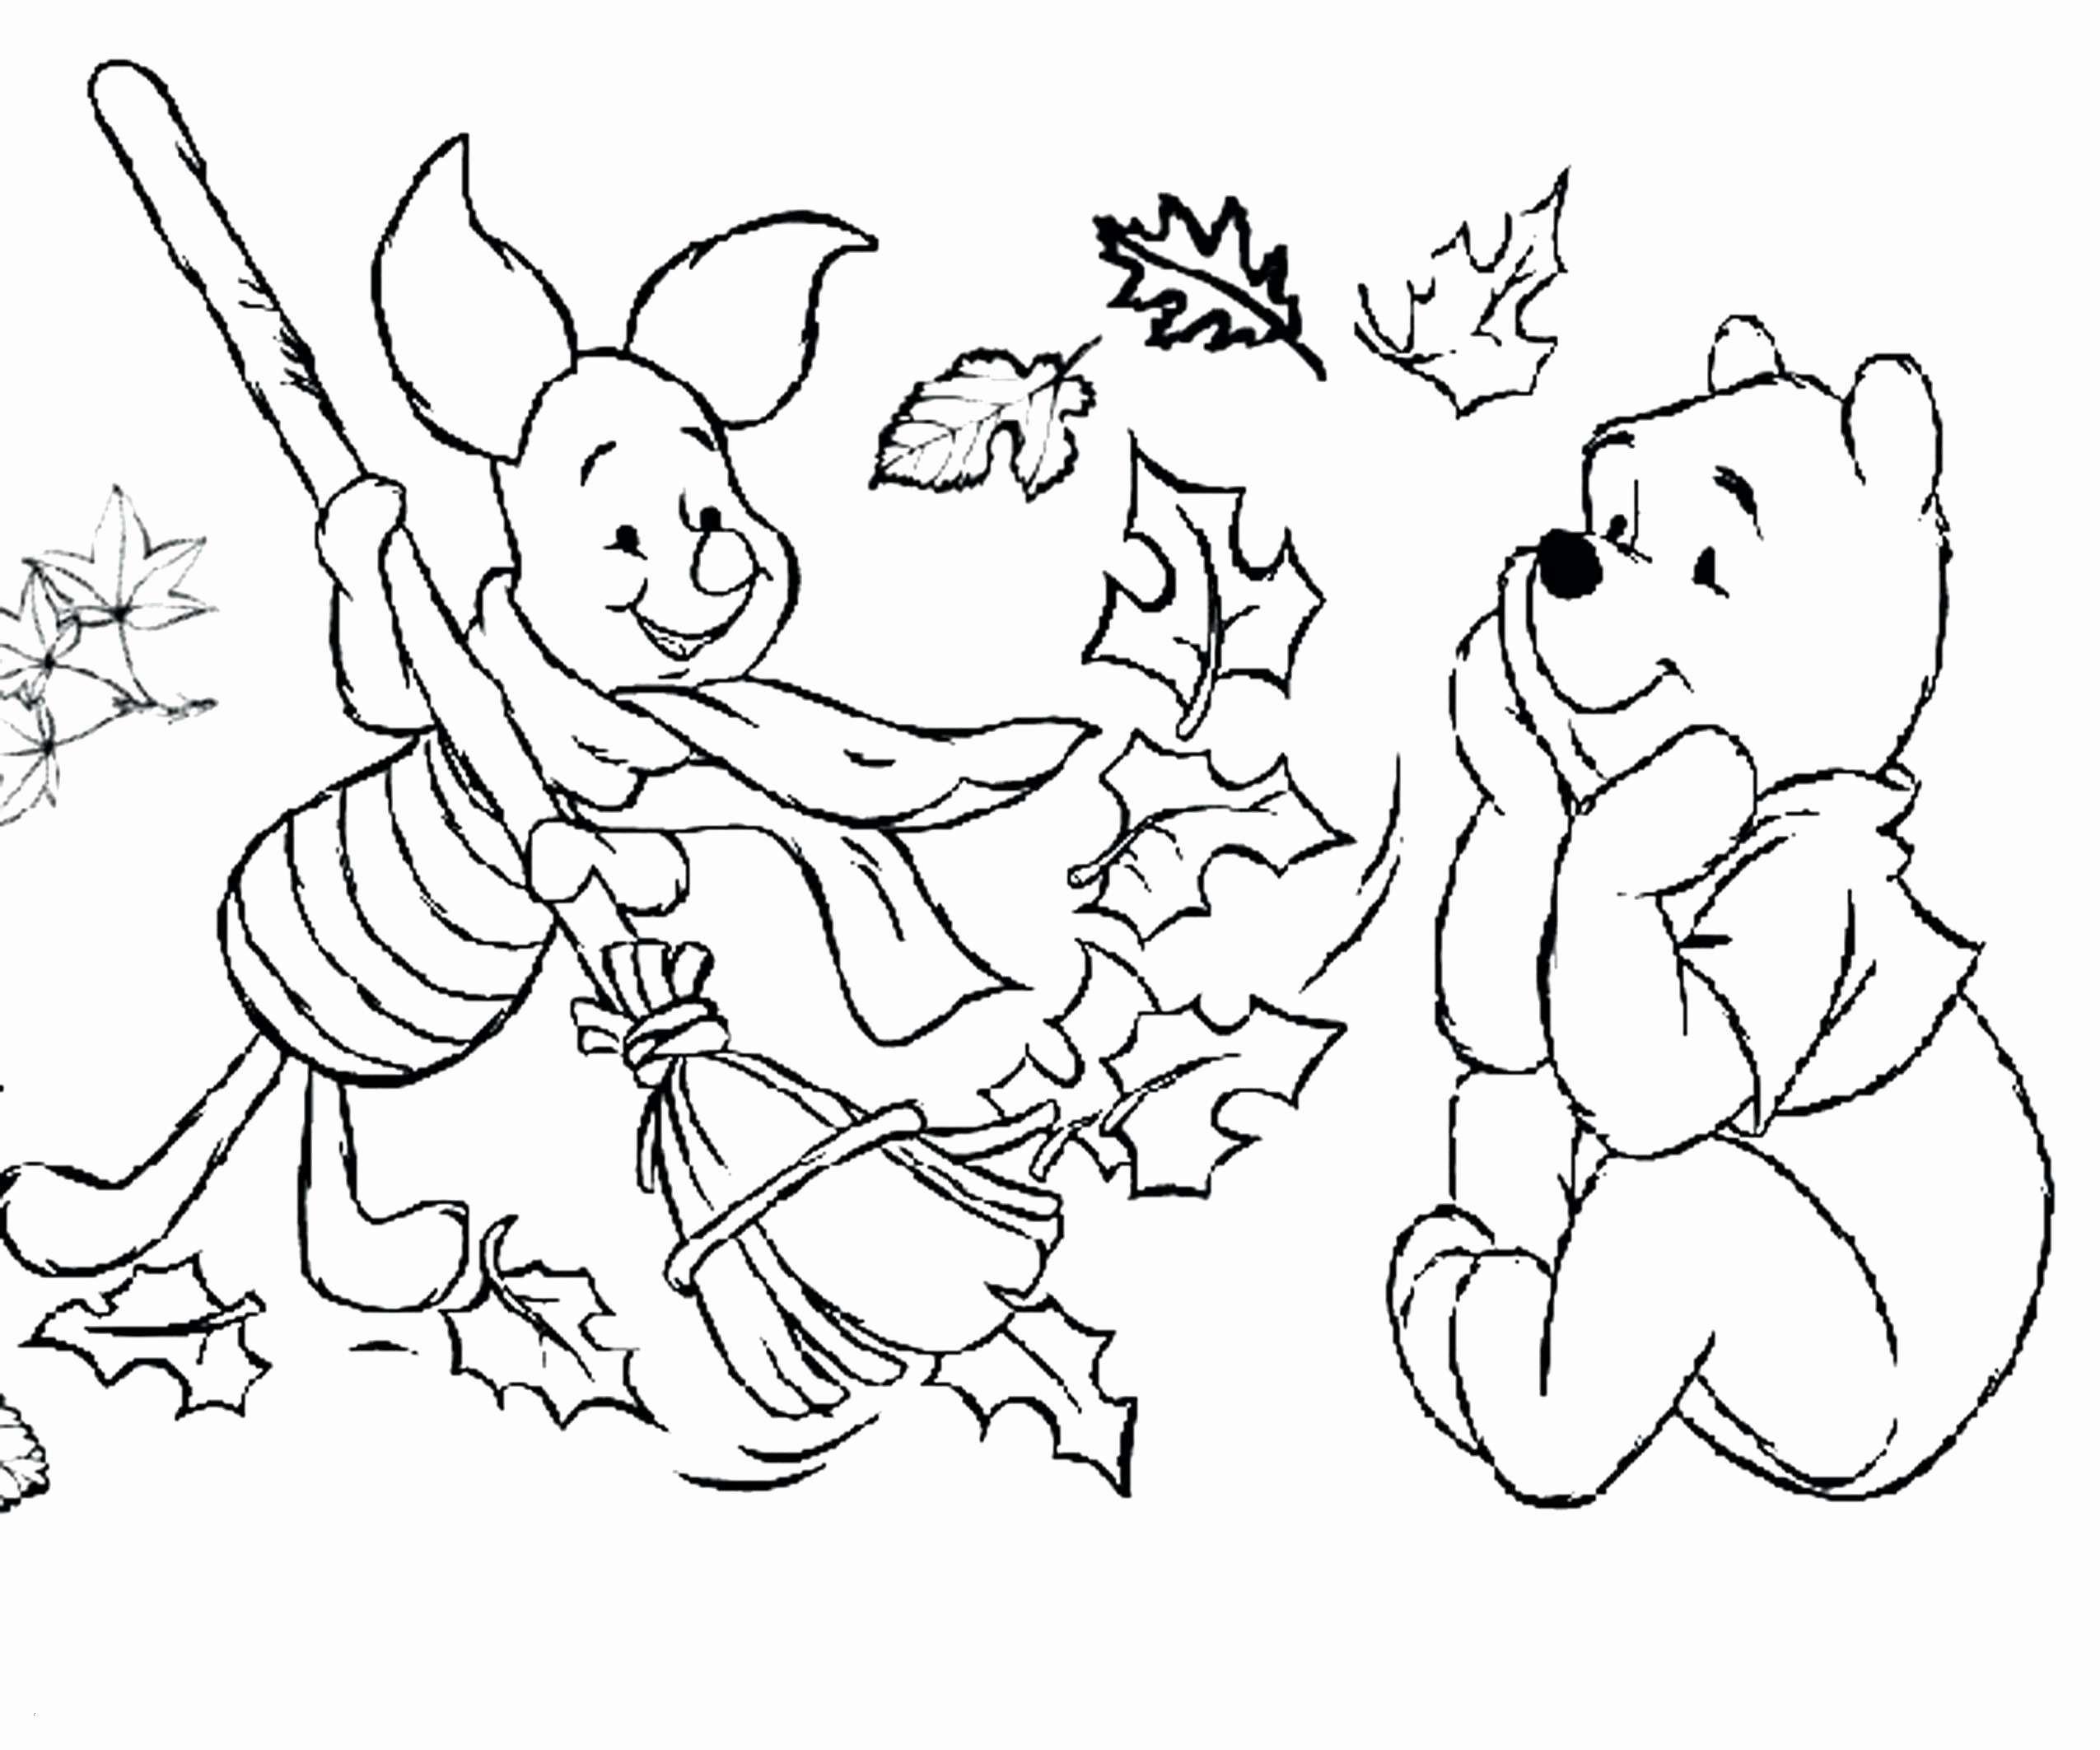 Ausmalbilder Herbst Eule Frisch Ausmalbilder Sam Uploadertalk Neu Herbst Ausmalbilder Pilze Genial Sammlung